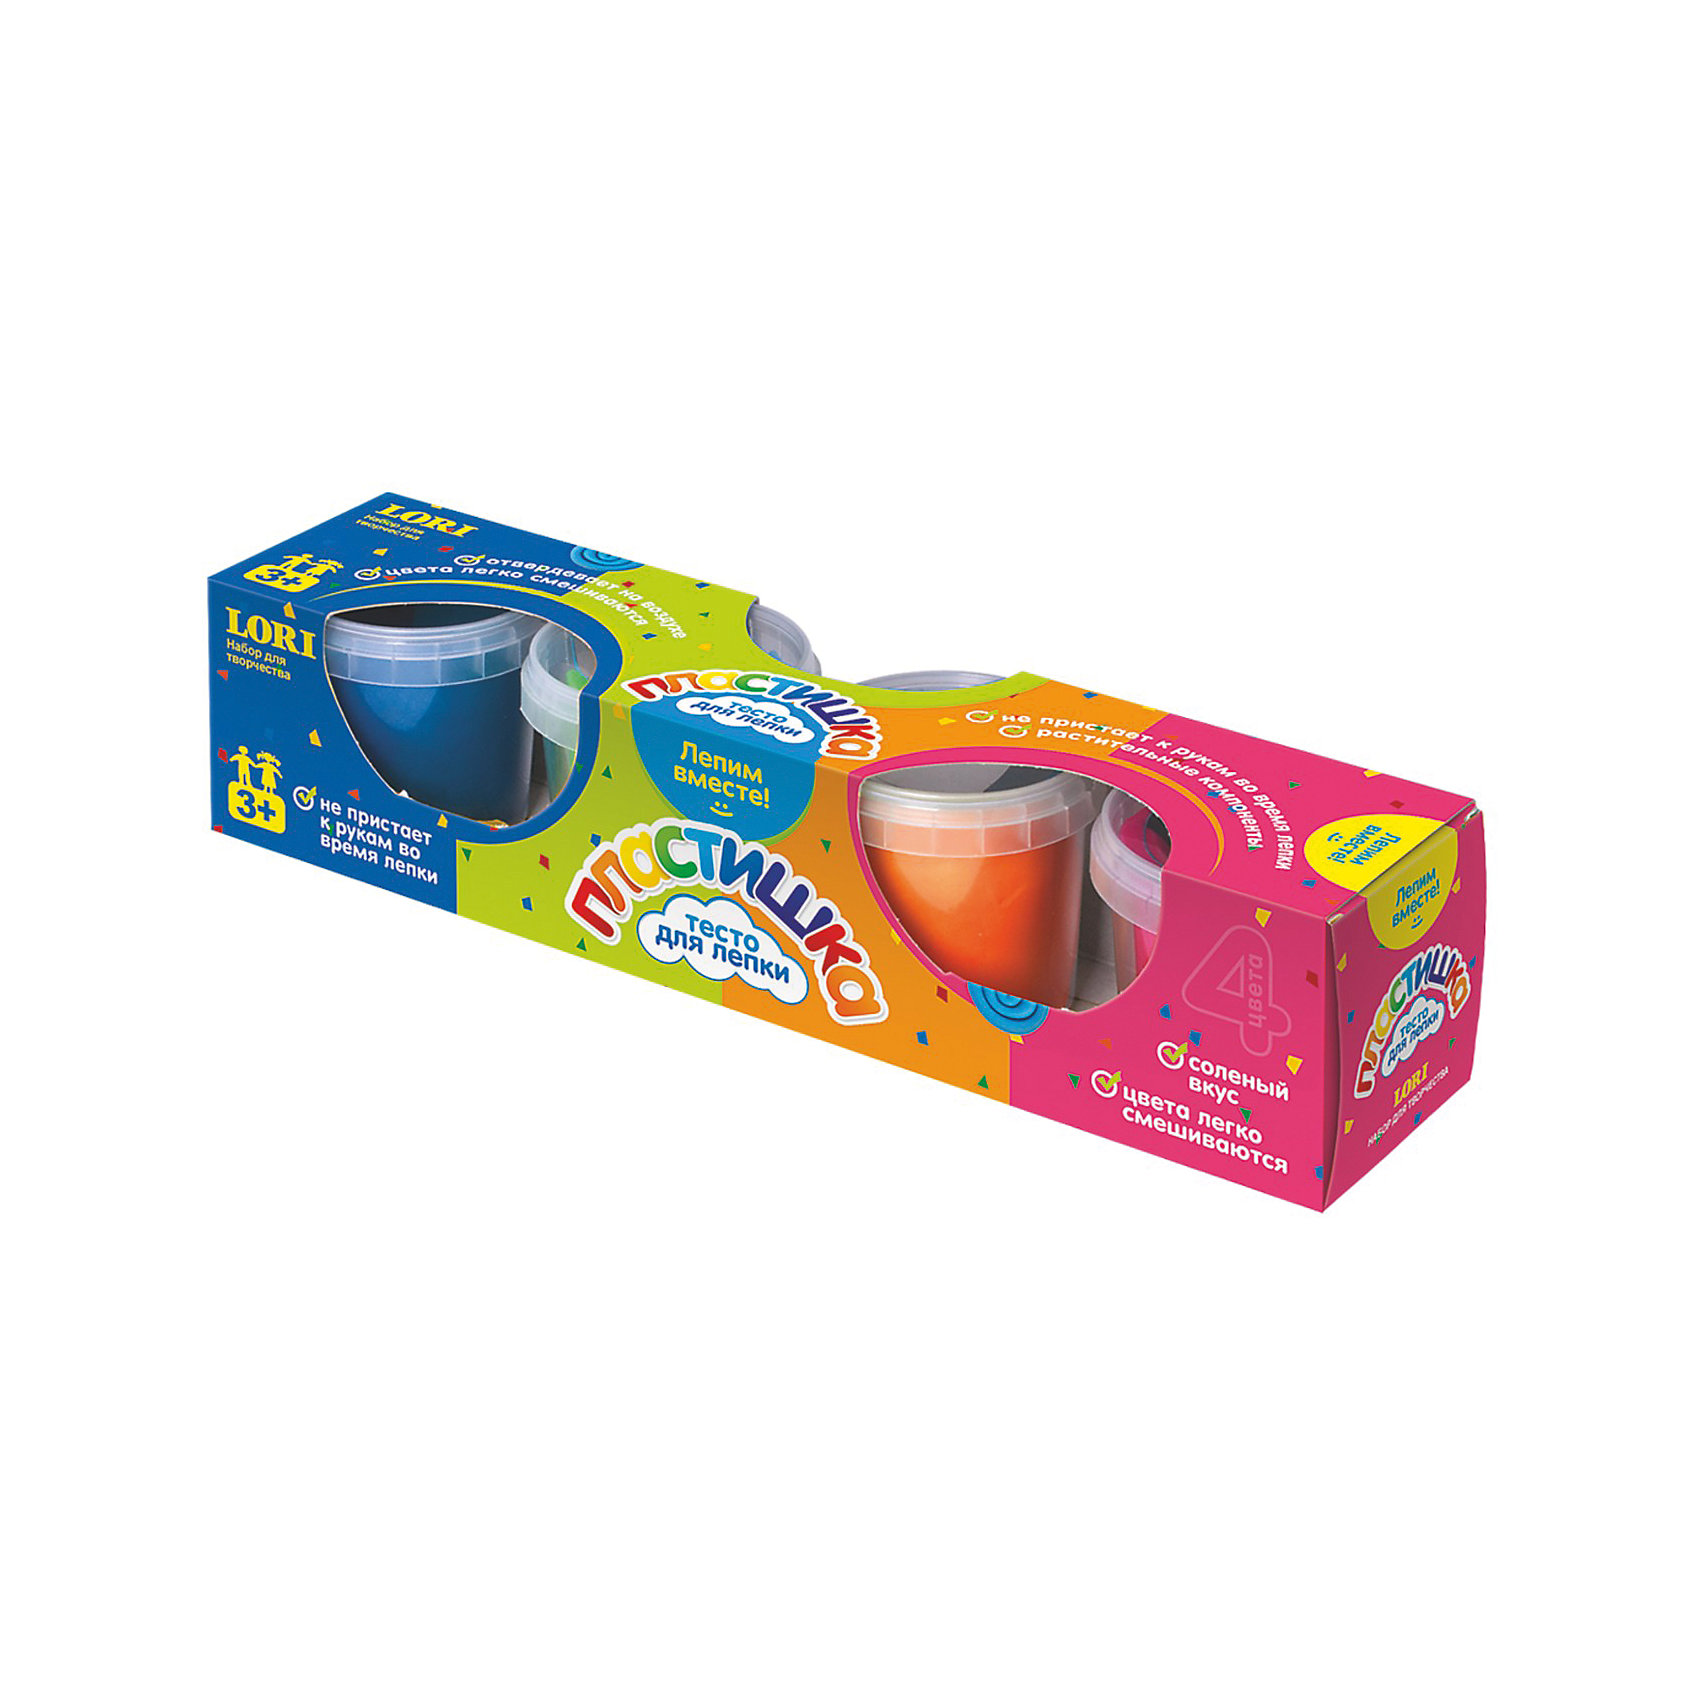 LORI Тесто для лепки Пластишка, 4цв. пластишка горка для купания детей пластишка